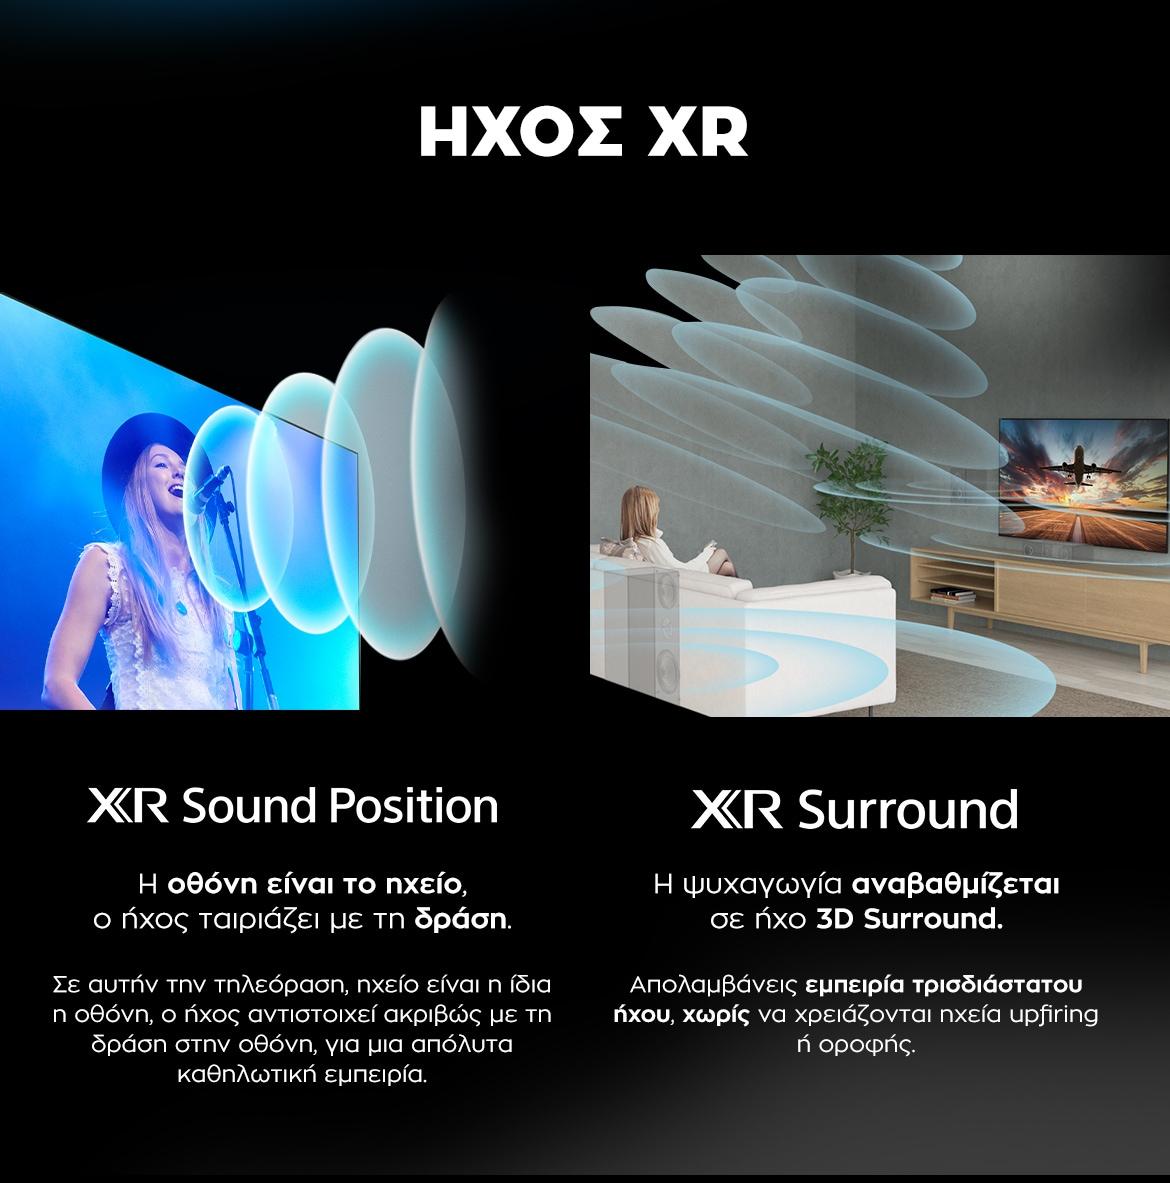 SONY Bravia XR OLED - Ήχος XR Sound Position & Surround